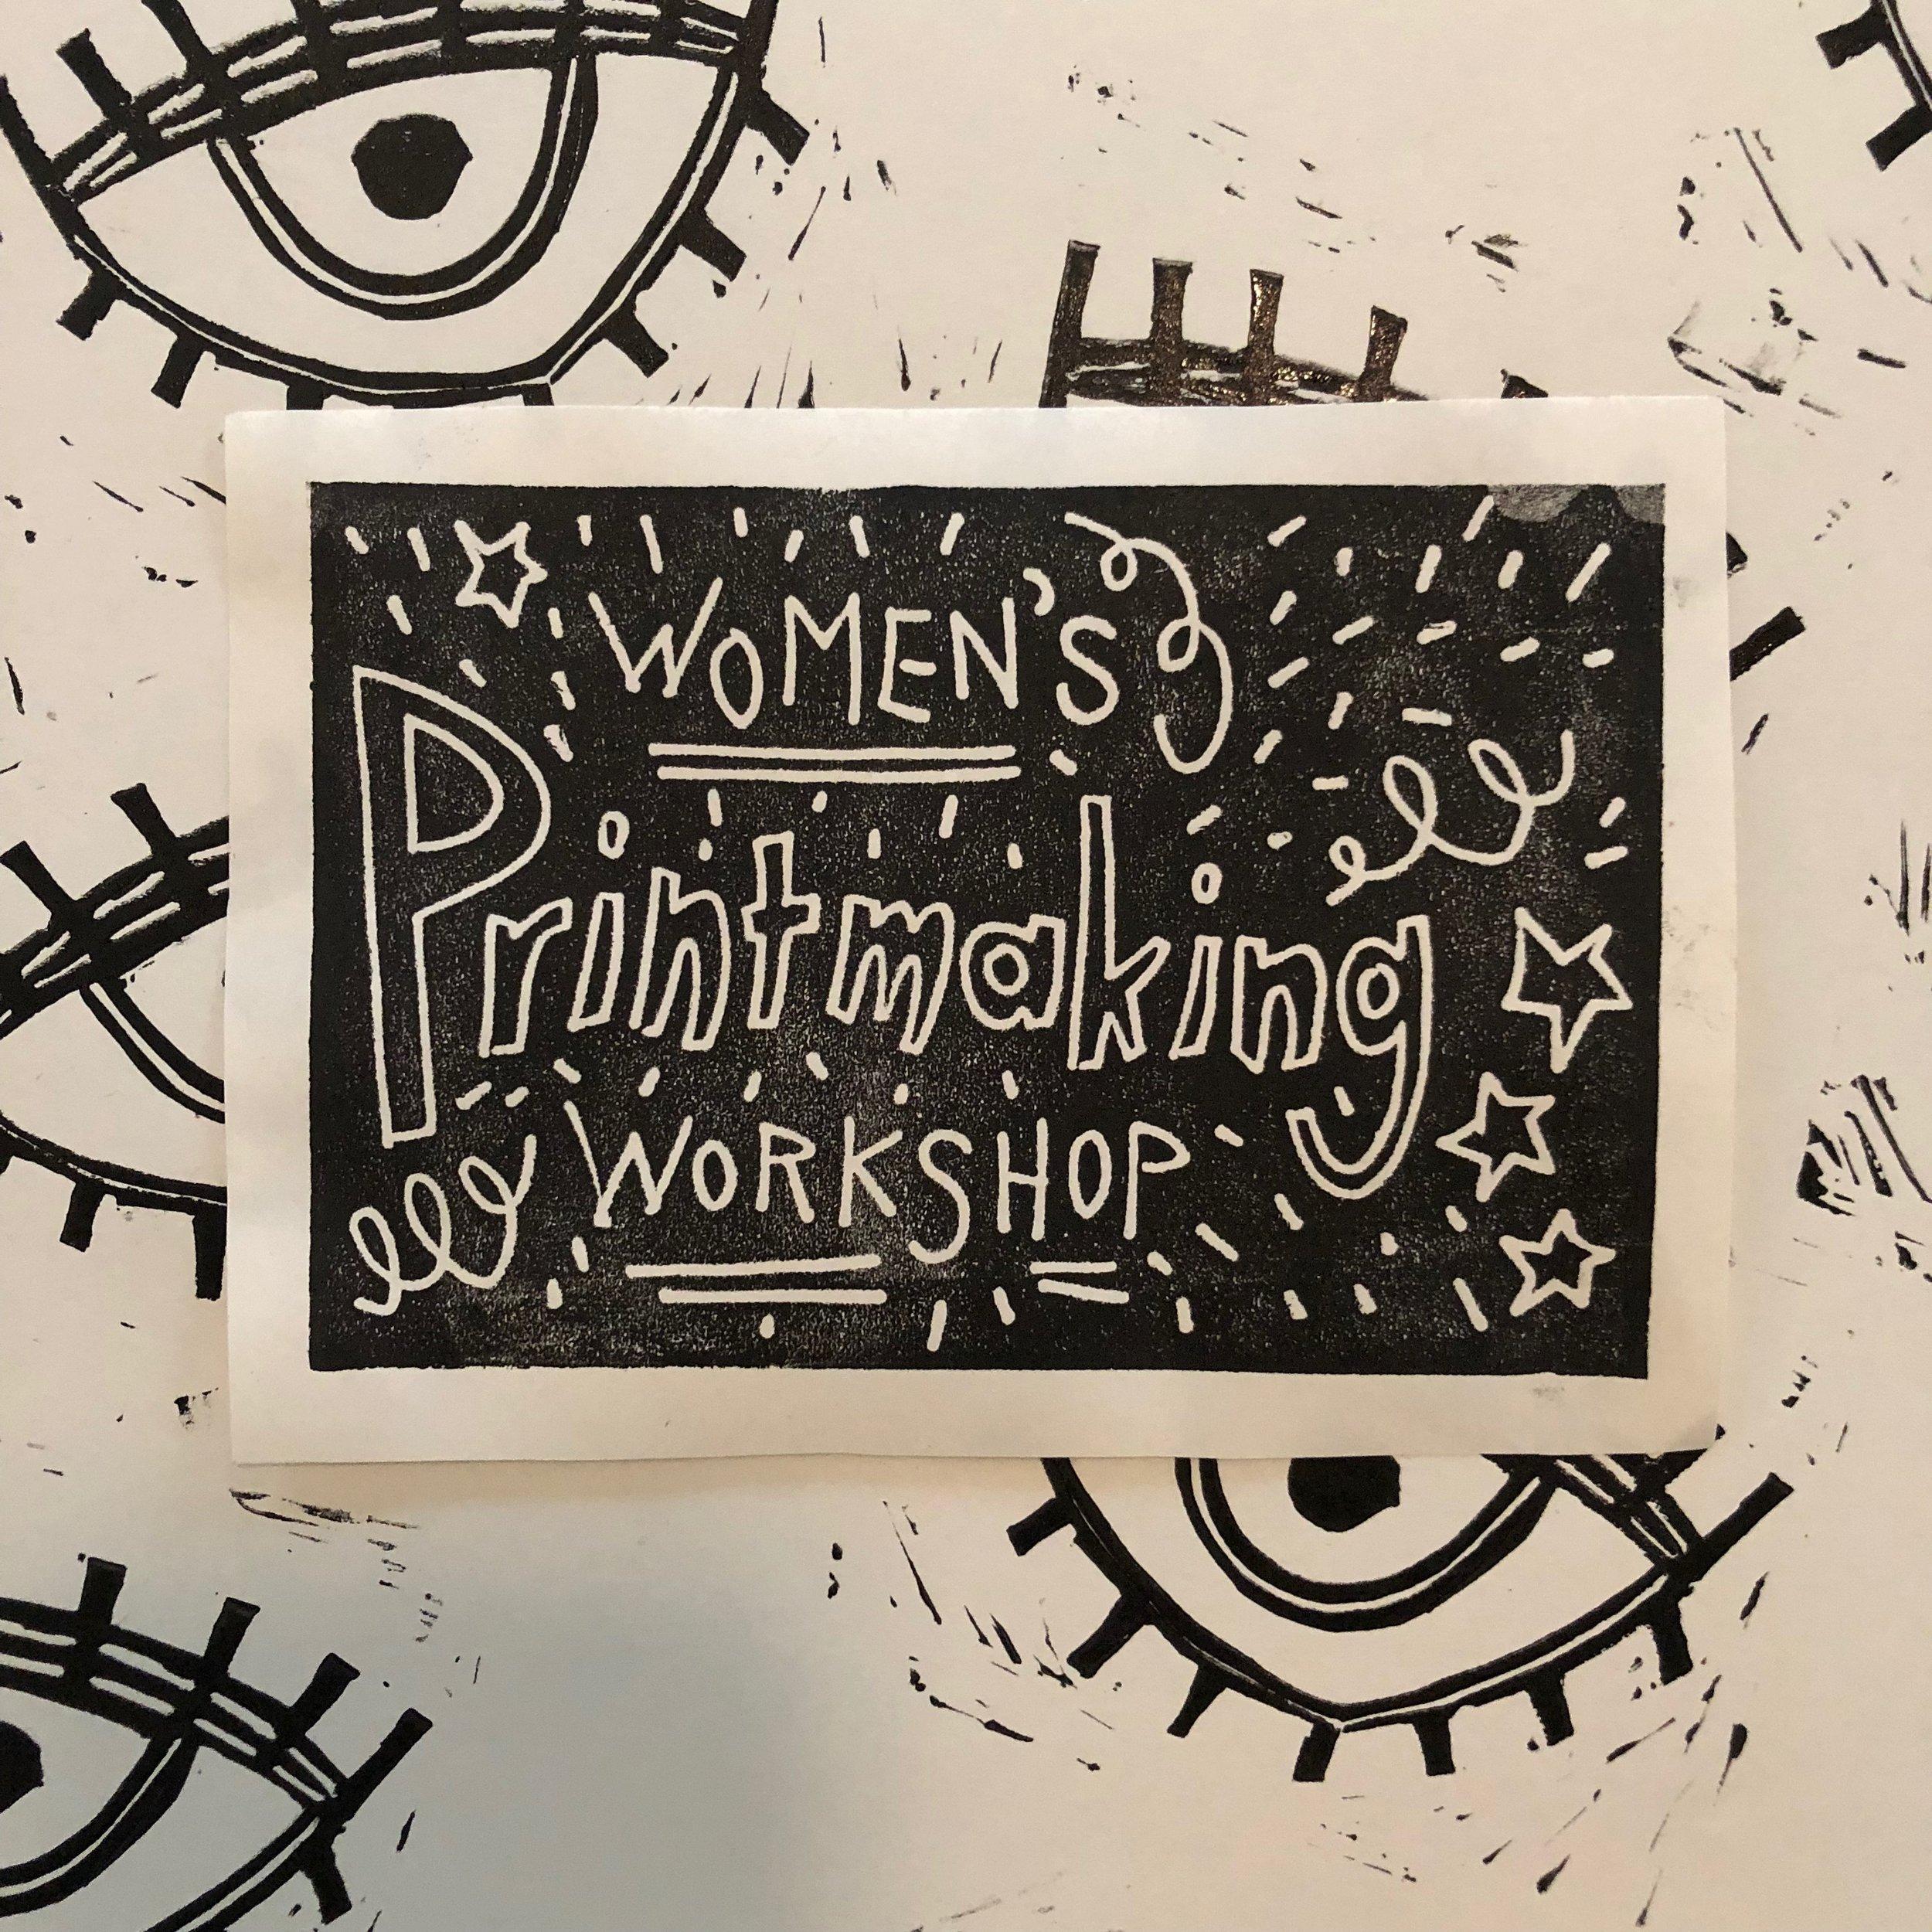 30a women's printmaking.JPG